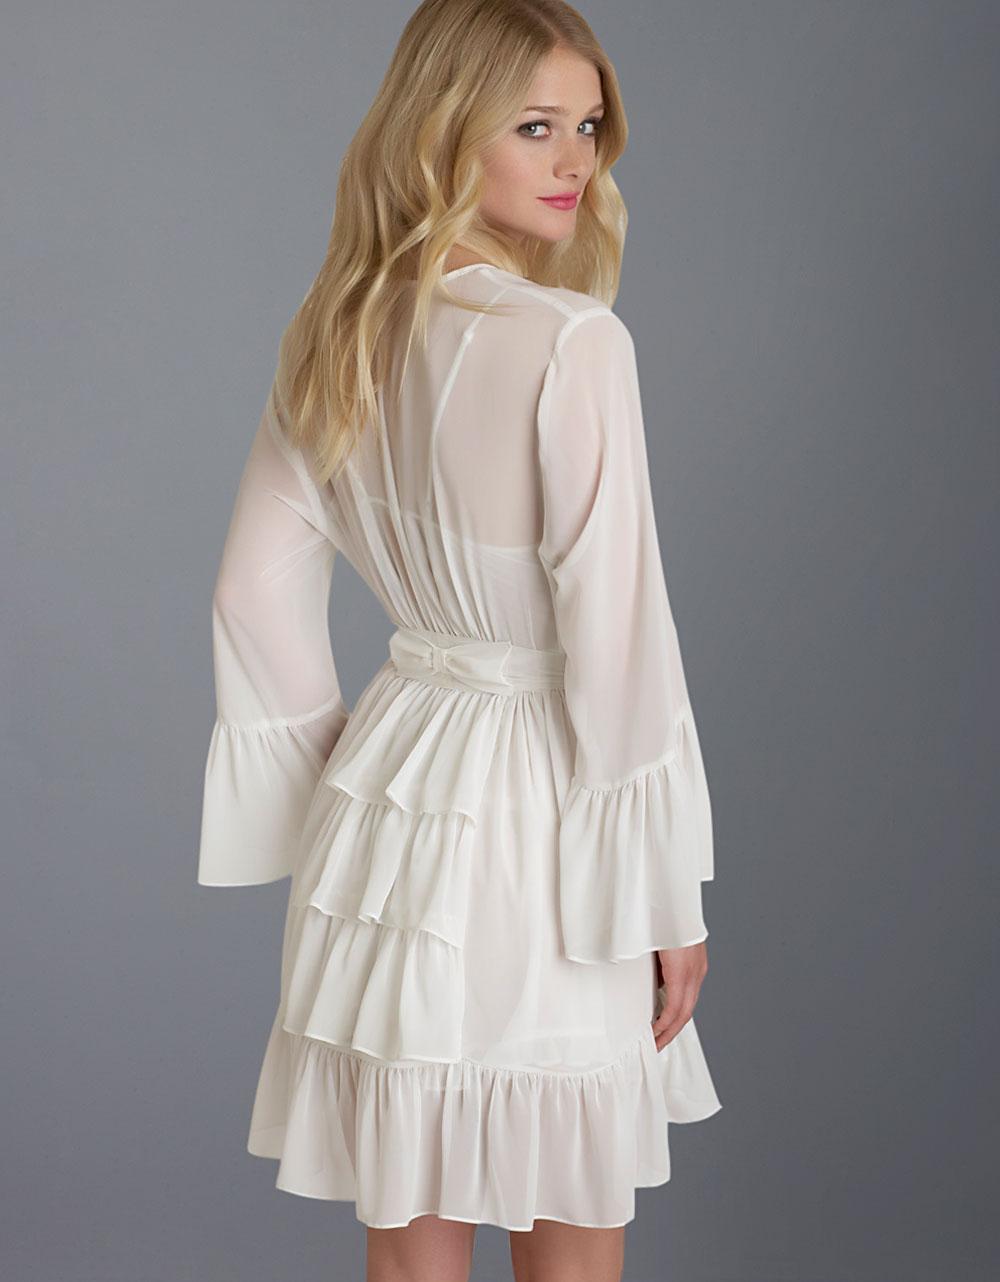 Betsey johnson chiffon ruffle wrap robe in white lyst for Robes de mariage de betsey johnson